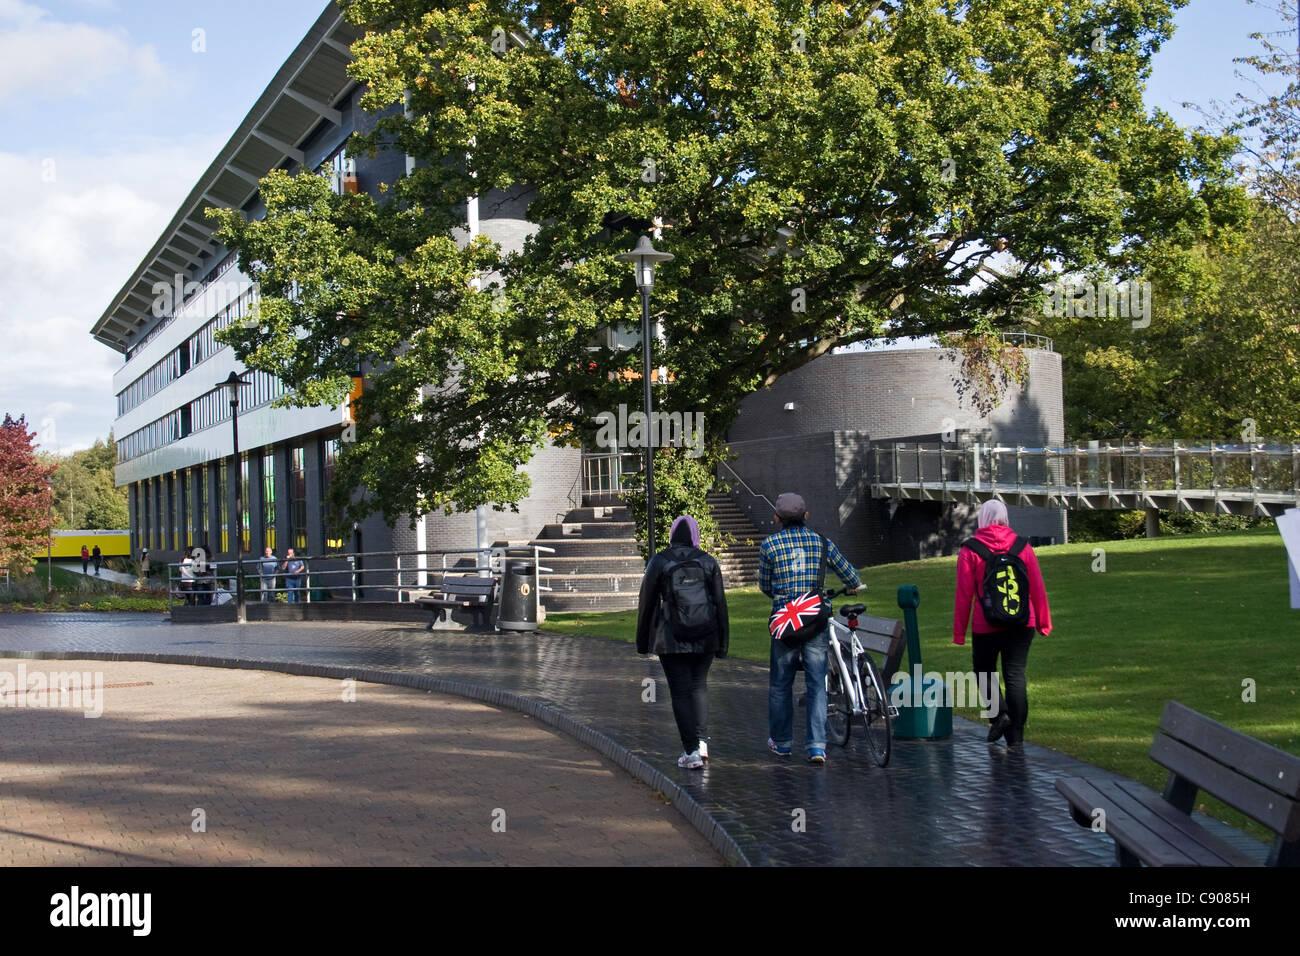 International Digital Laboratory, University of Warwick, Coventry, West Midlands, England, UK - Stock Image